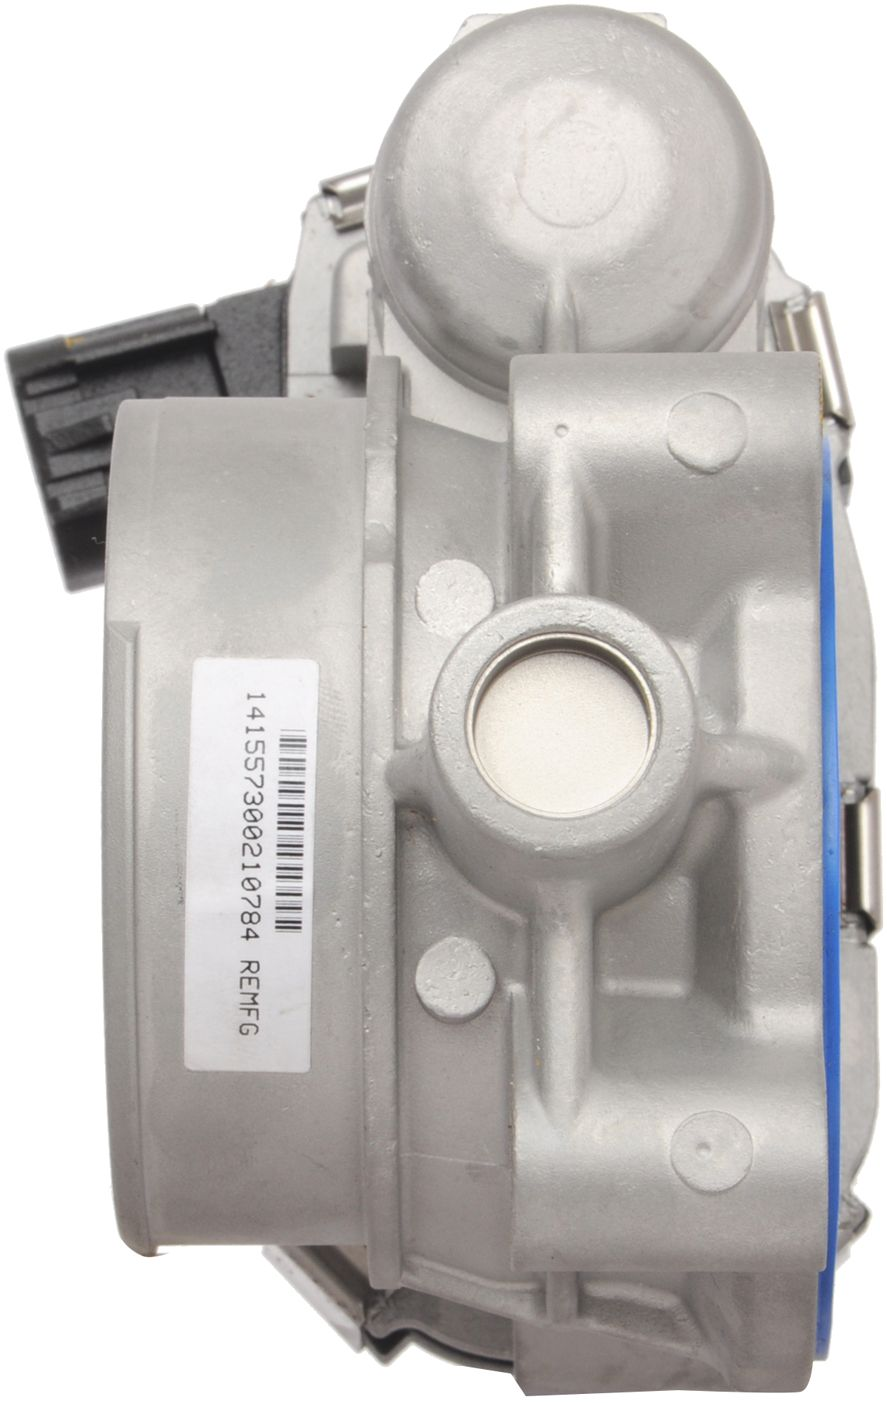 2009 Pontiac G6 Fuel Injection Throttle Body A1 67-3002